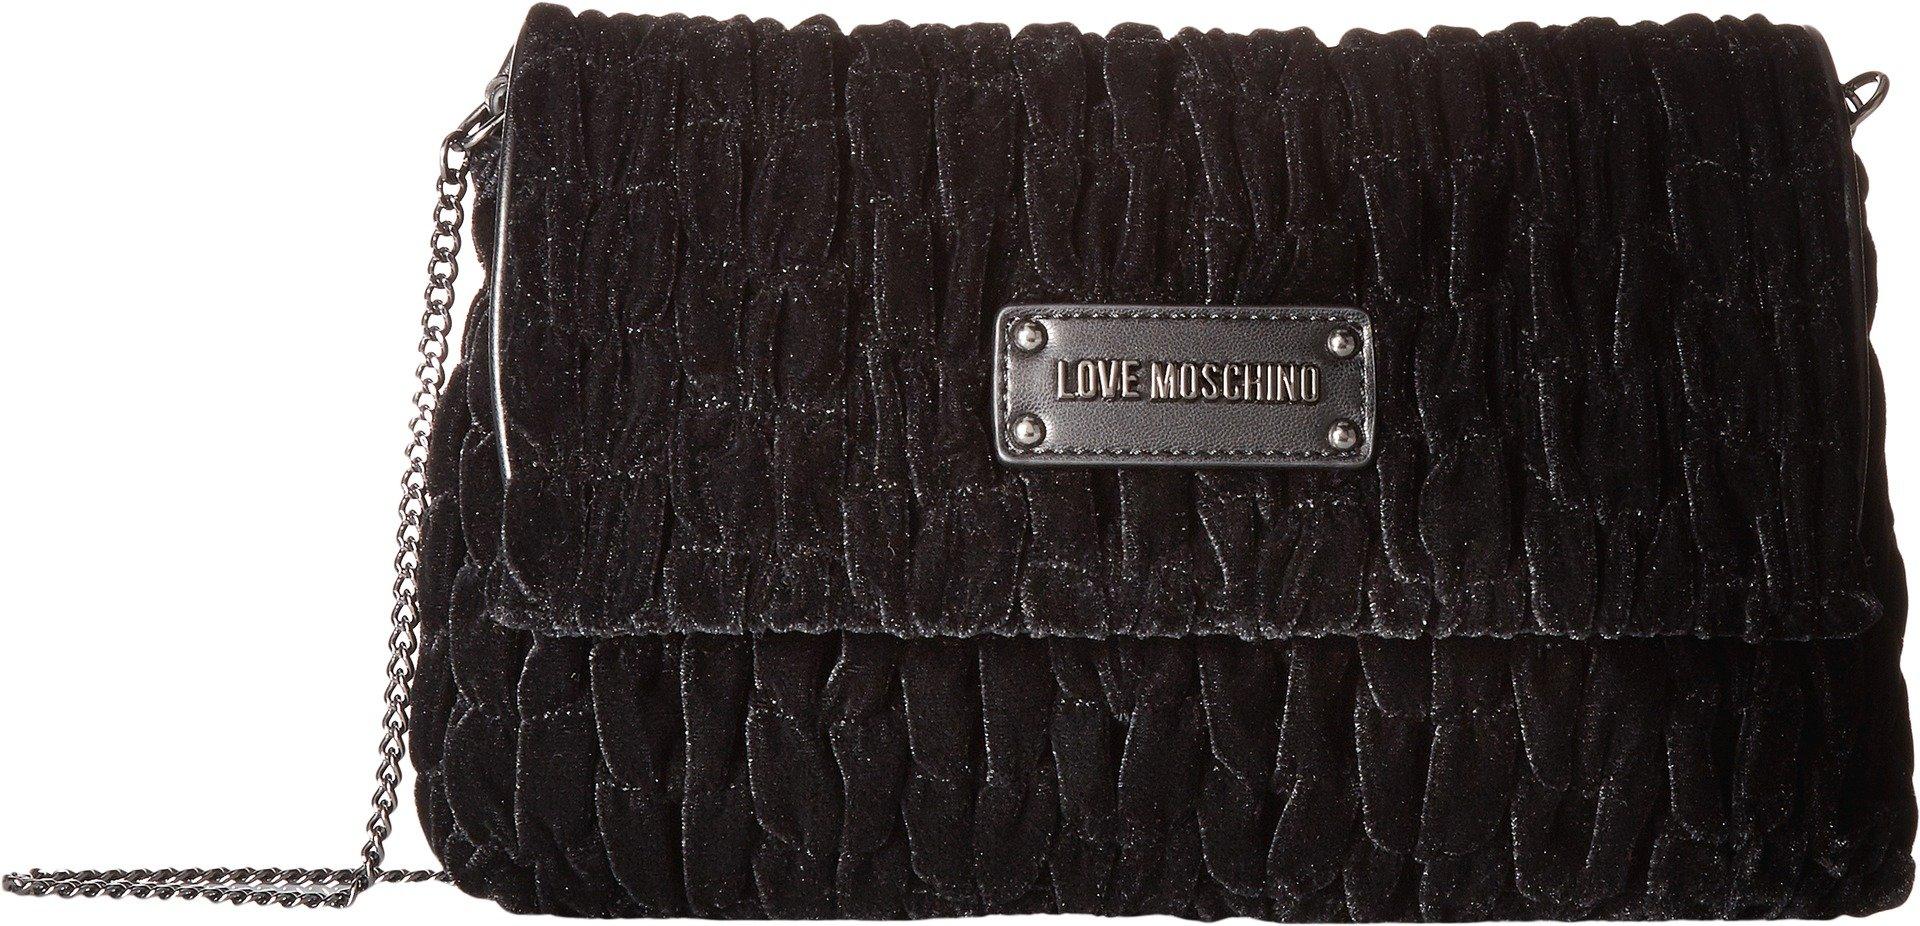 LOVE Moschino Women's Velvet Gathered Rectangle Bag Black One Size